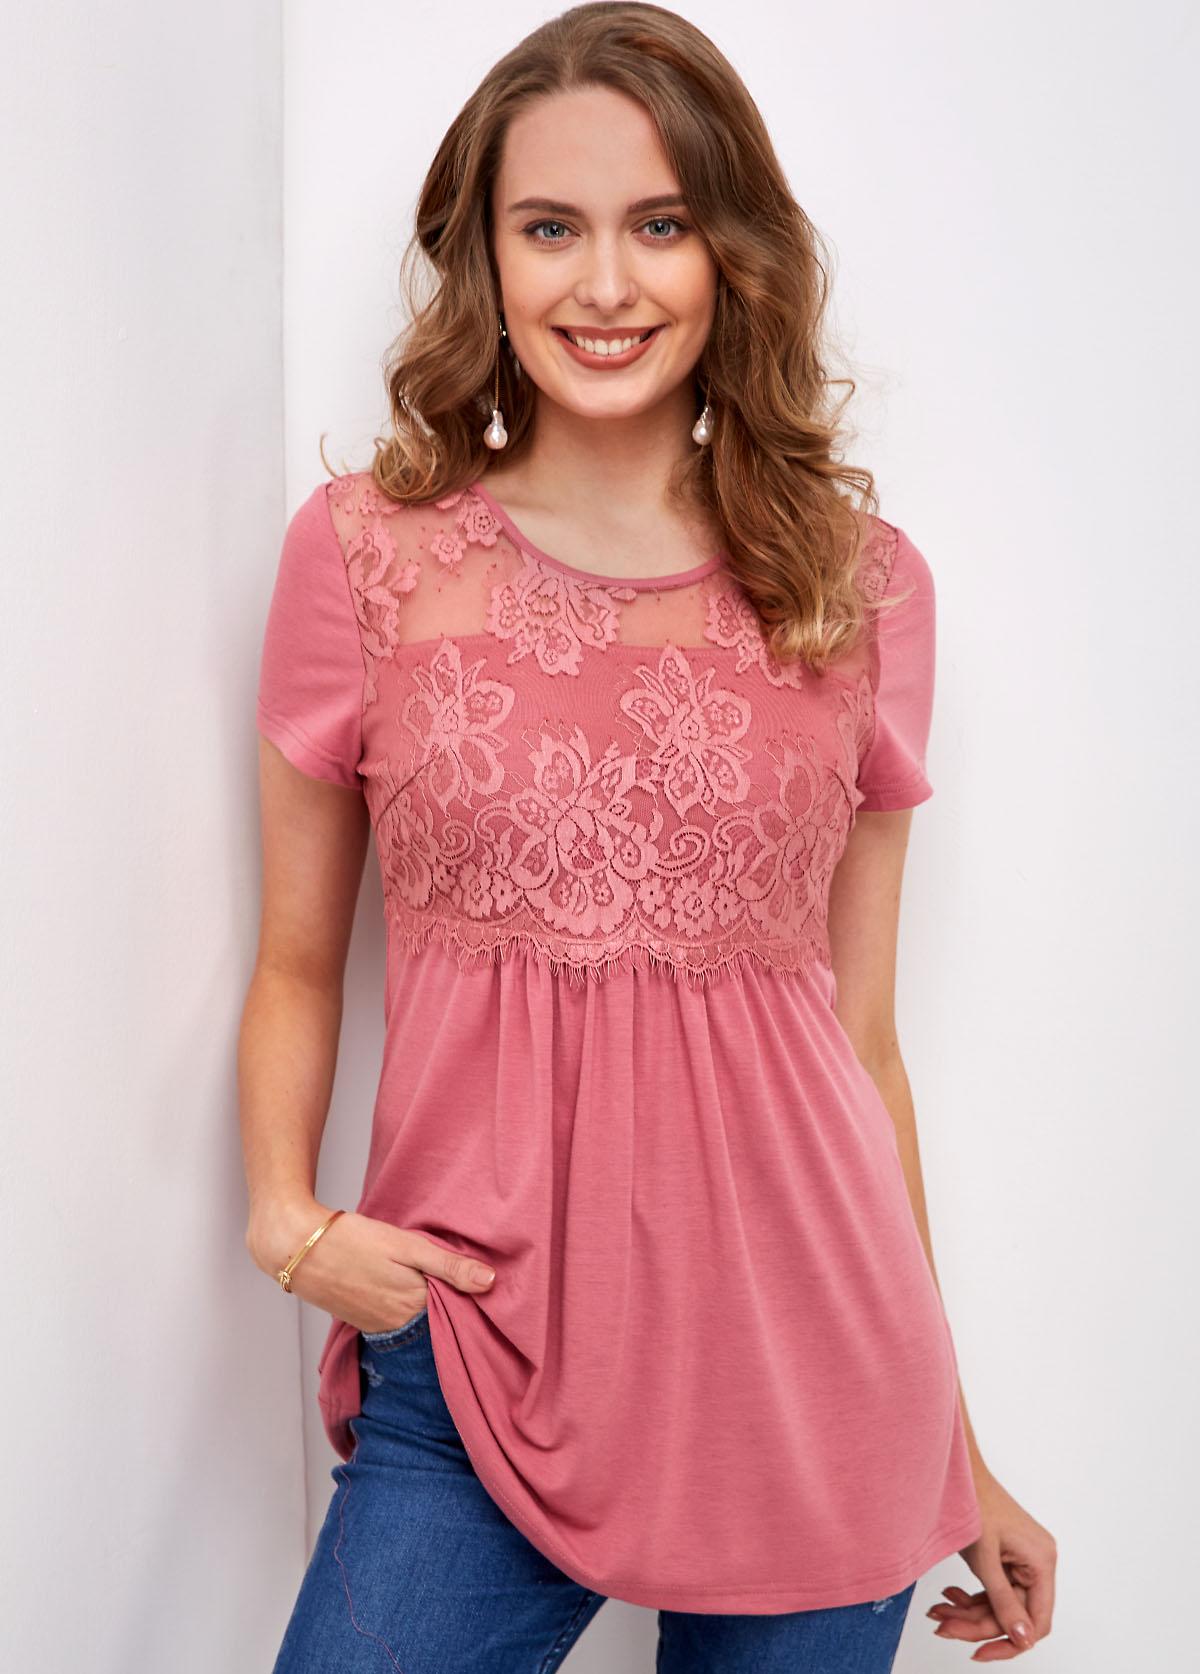 ROTITA Lace Stitching Short Sleeve Round Neck T Shirt